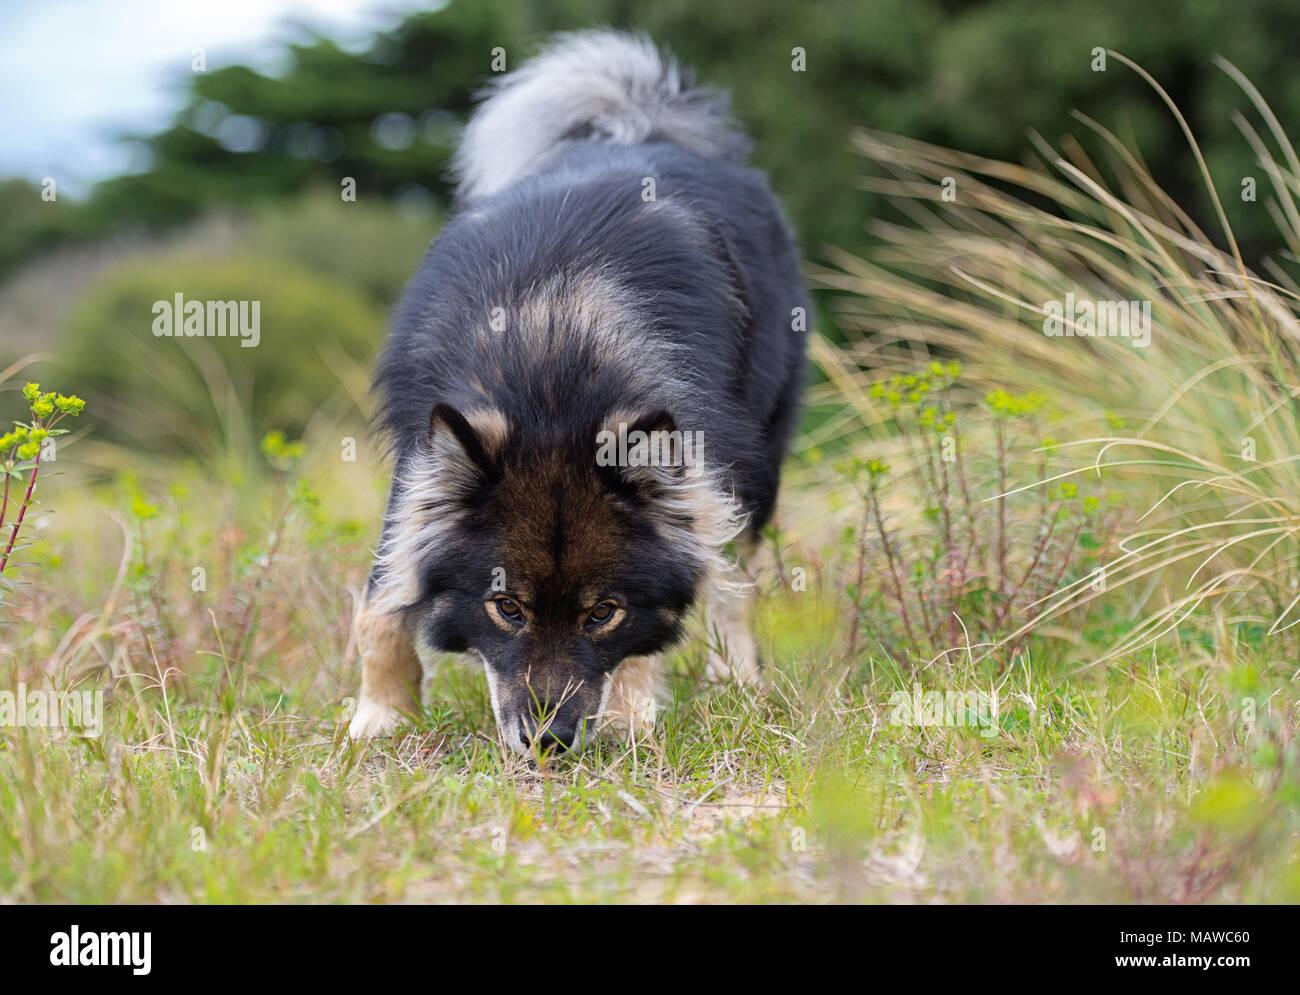 Finnish Lapphund Dog sniffing the ground - Stock Image